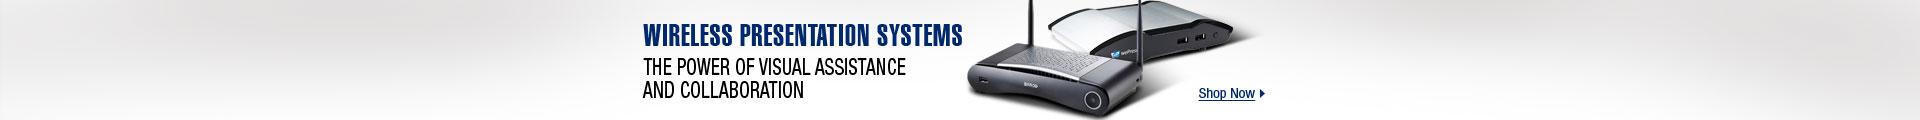 Wireless Presentations Systems